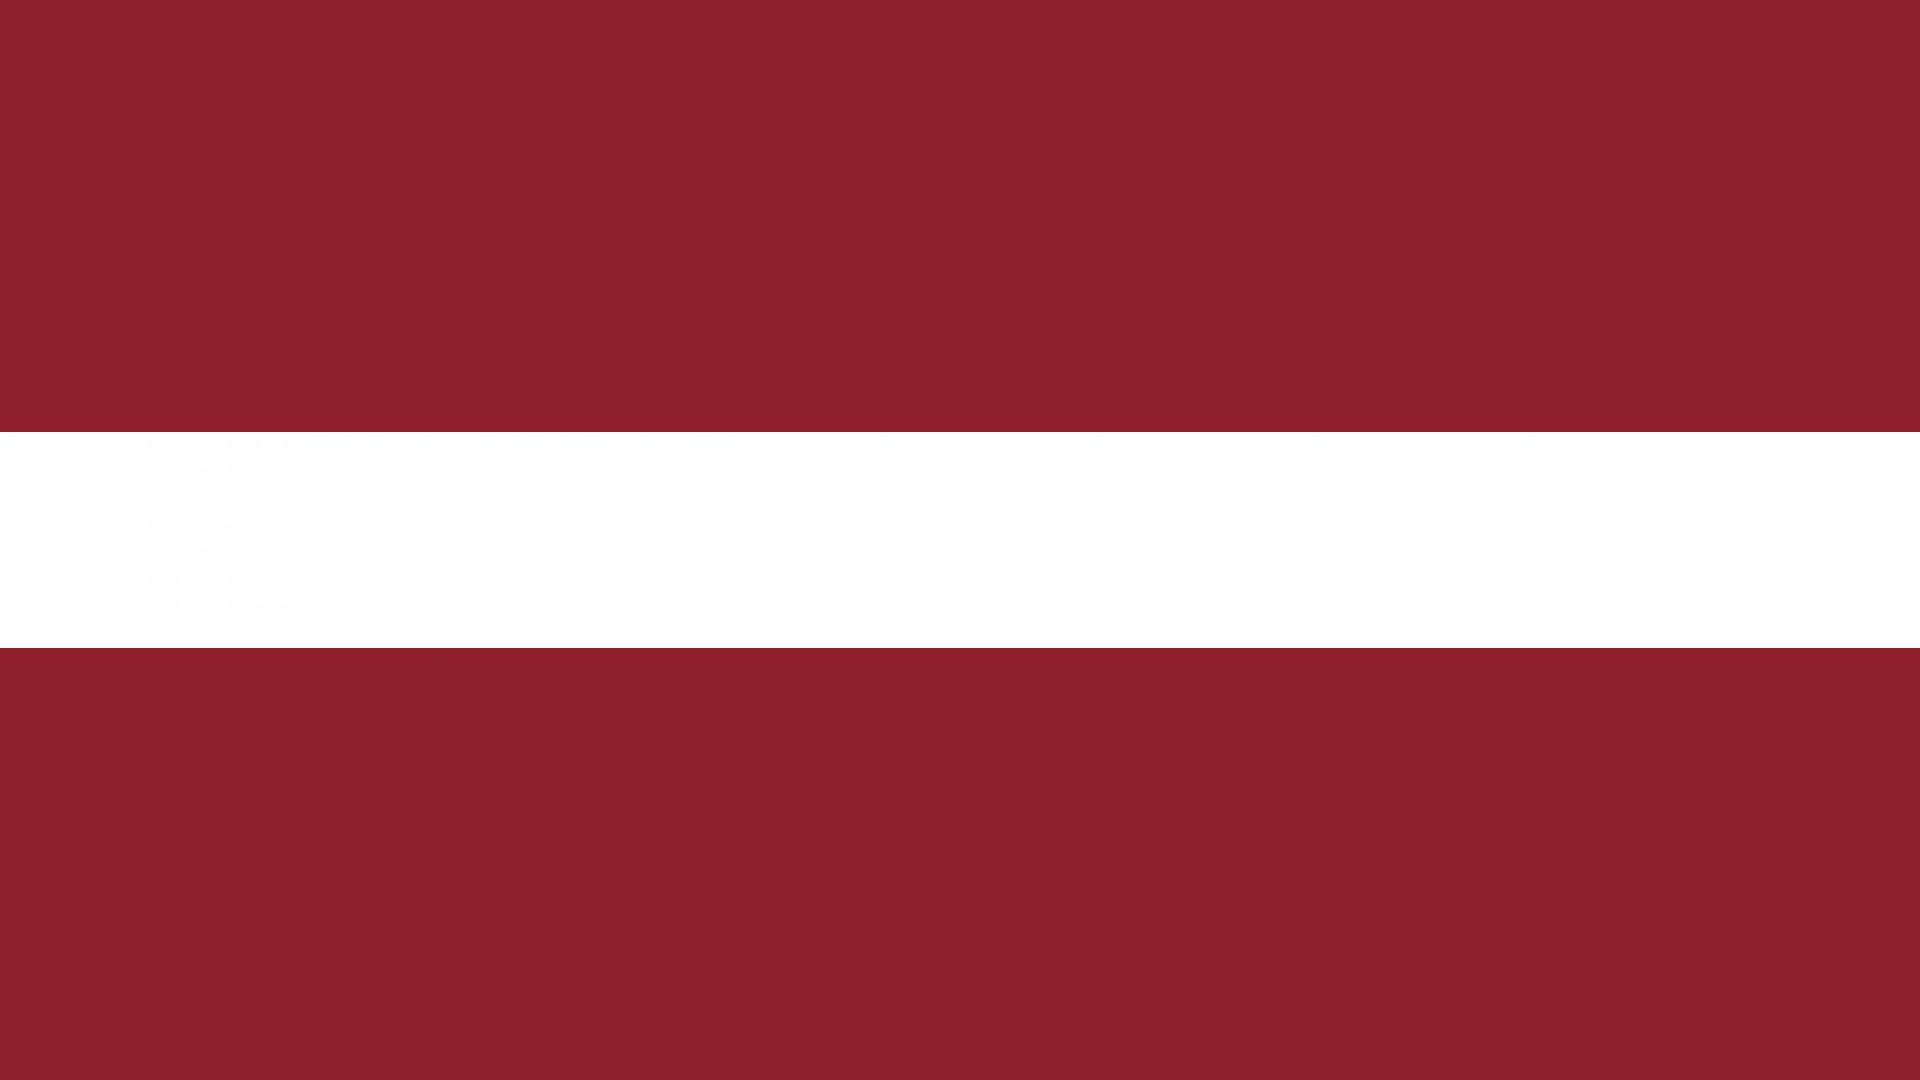 latvia flag desktop wallpaper 52177